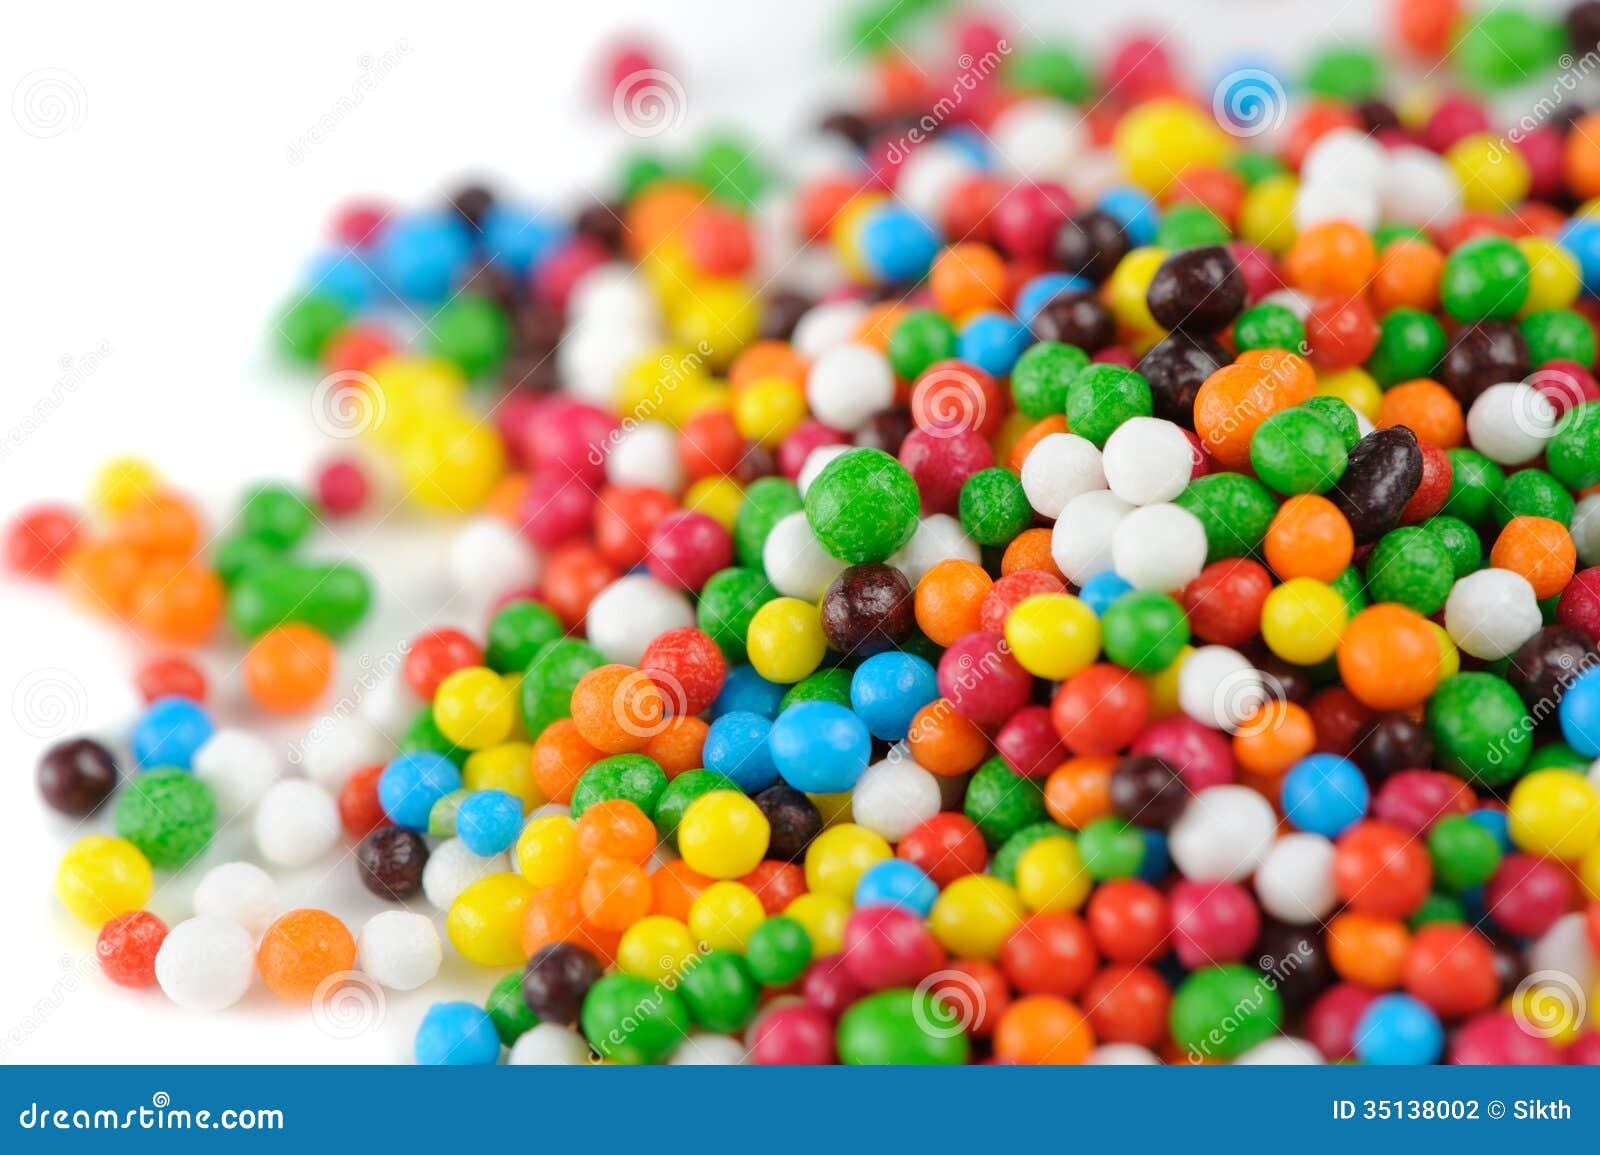 Multicolored Sugar Sprinkles (Edible Cupcake Decorations) Close-Up ...